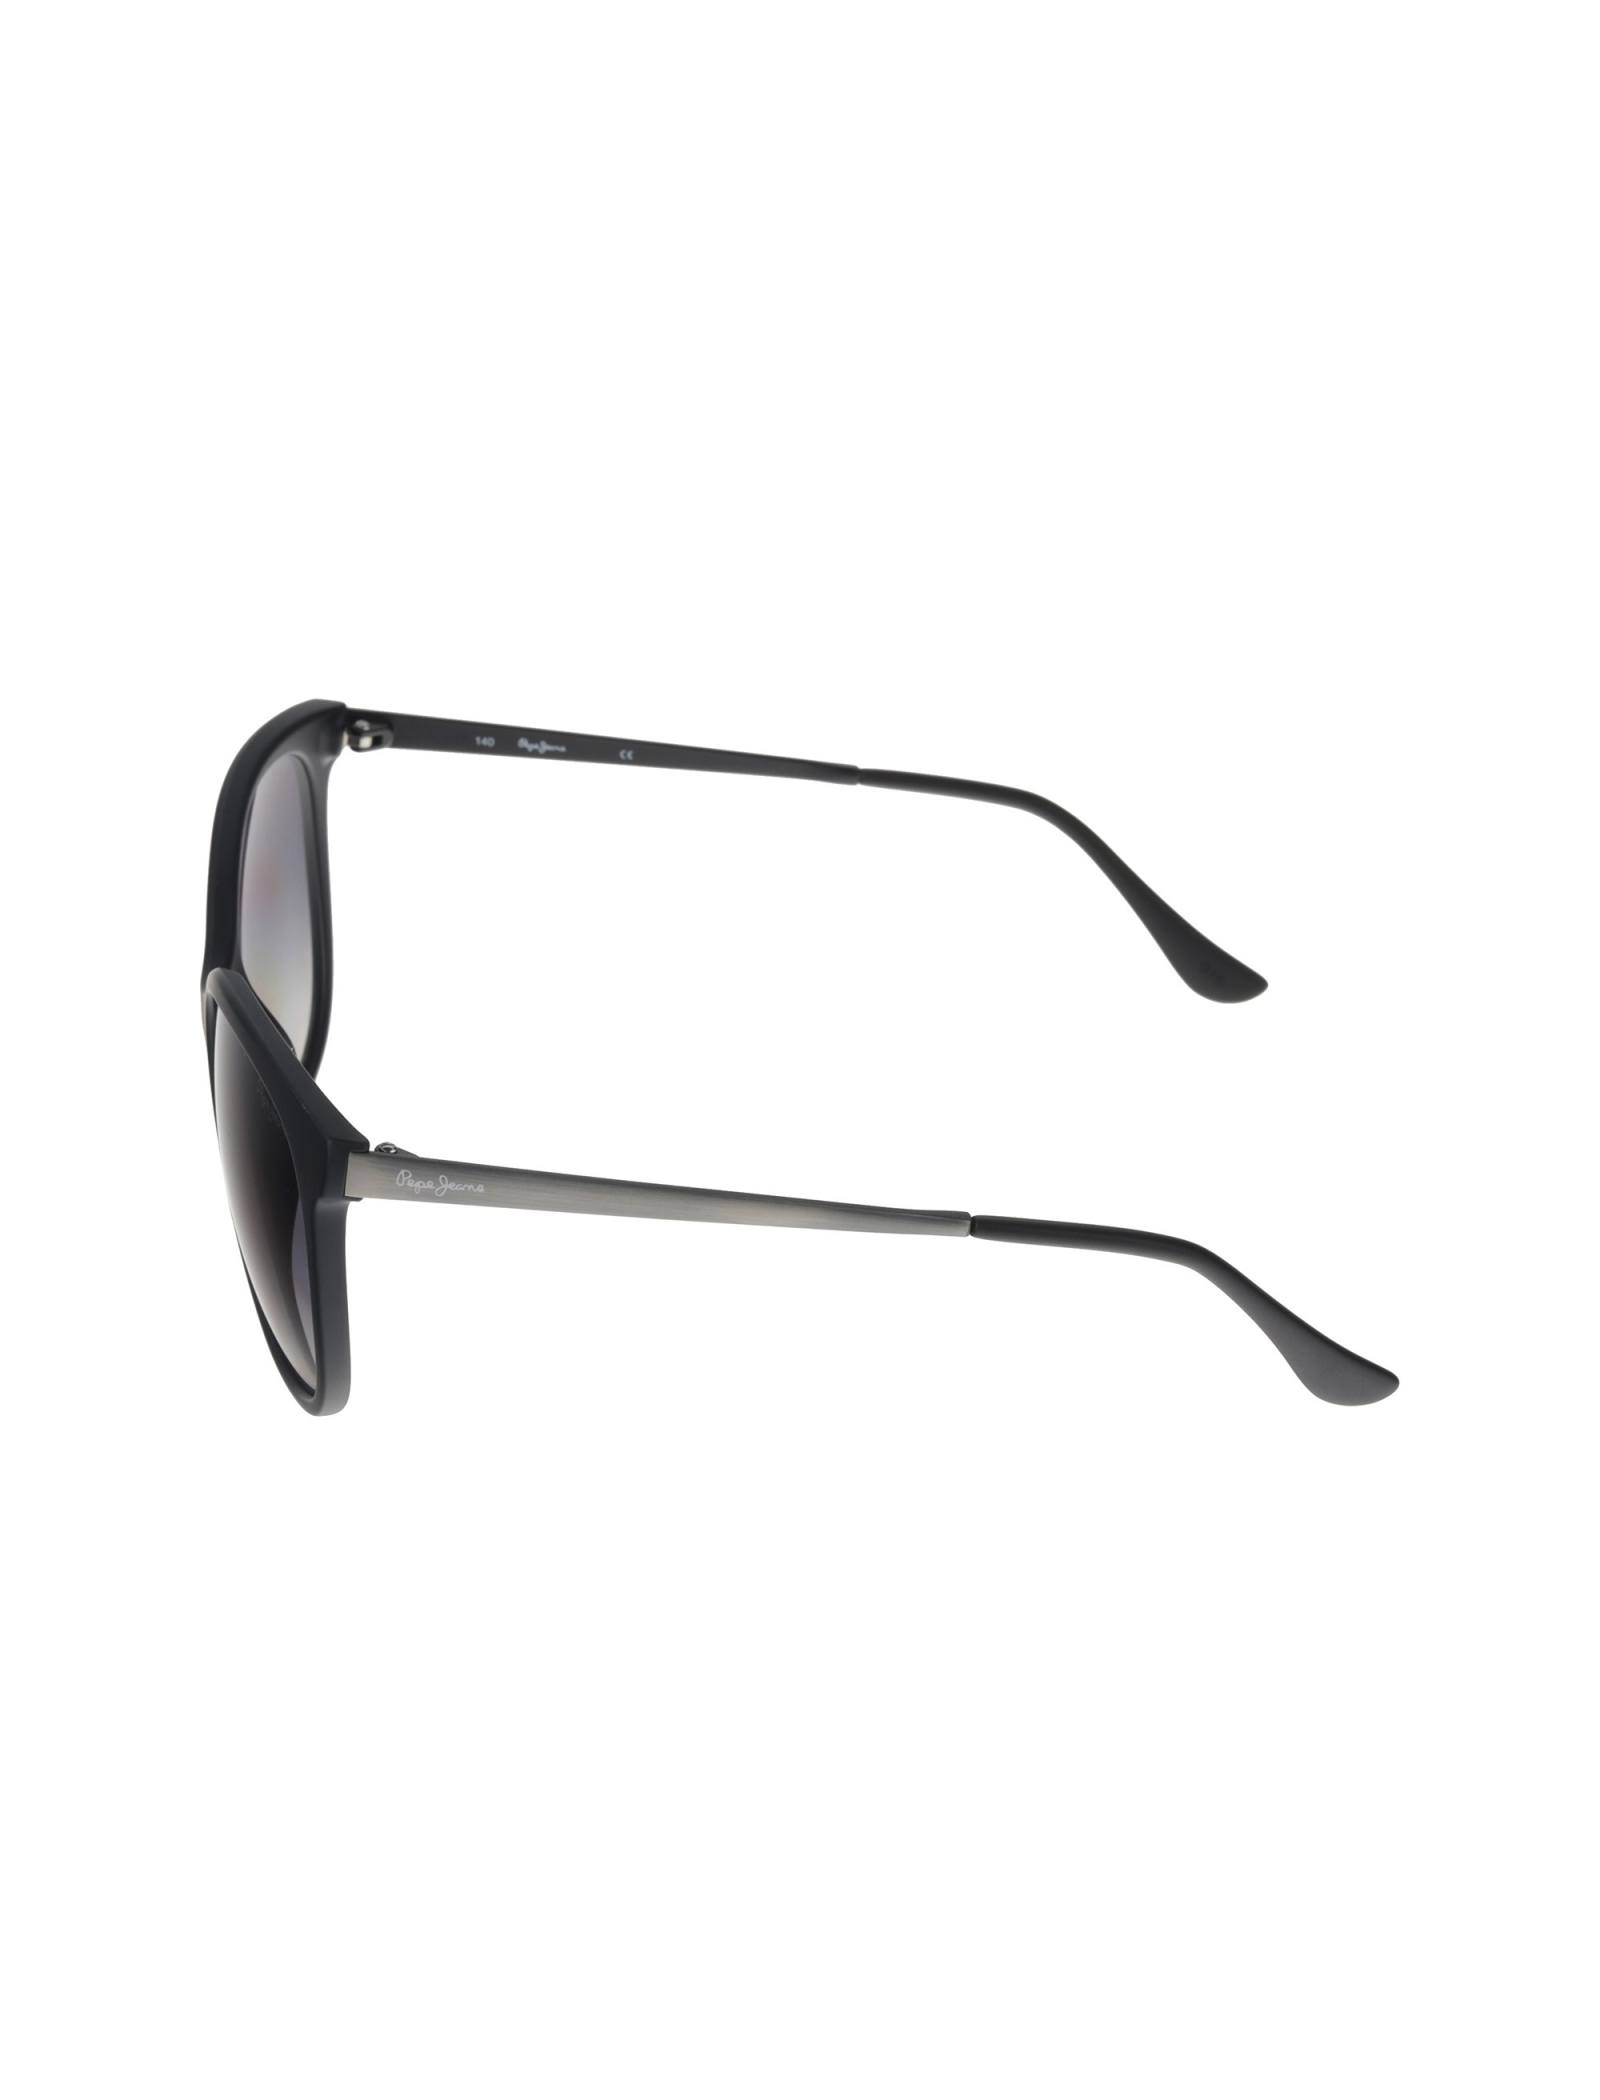 عینک آفتابی ویفرر زنانه - پپه جینز - مشکي - 3